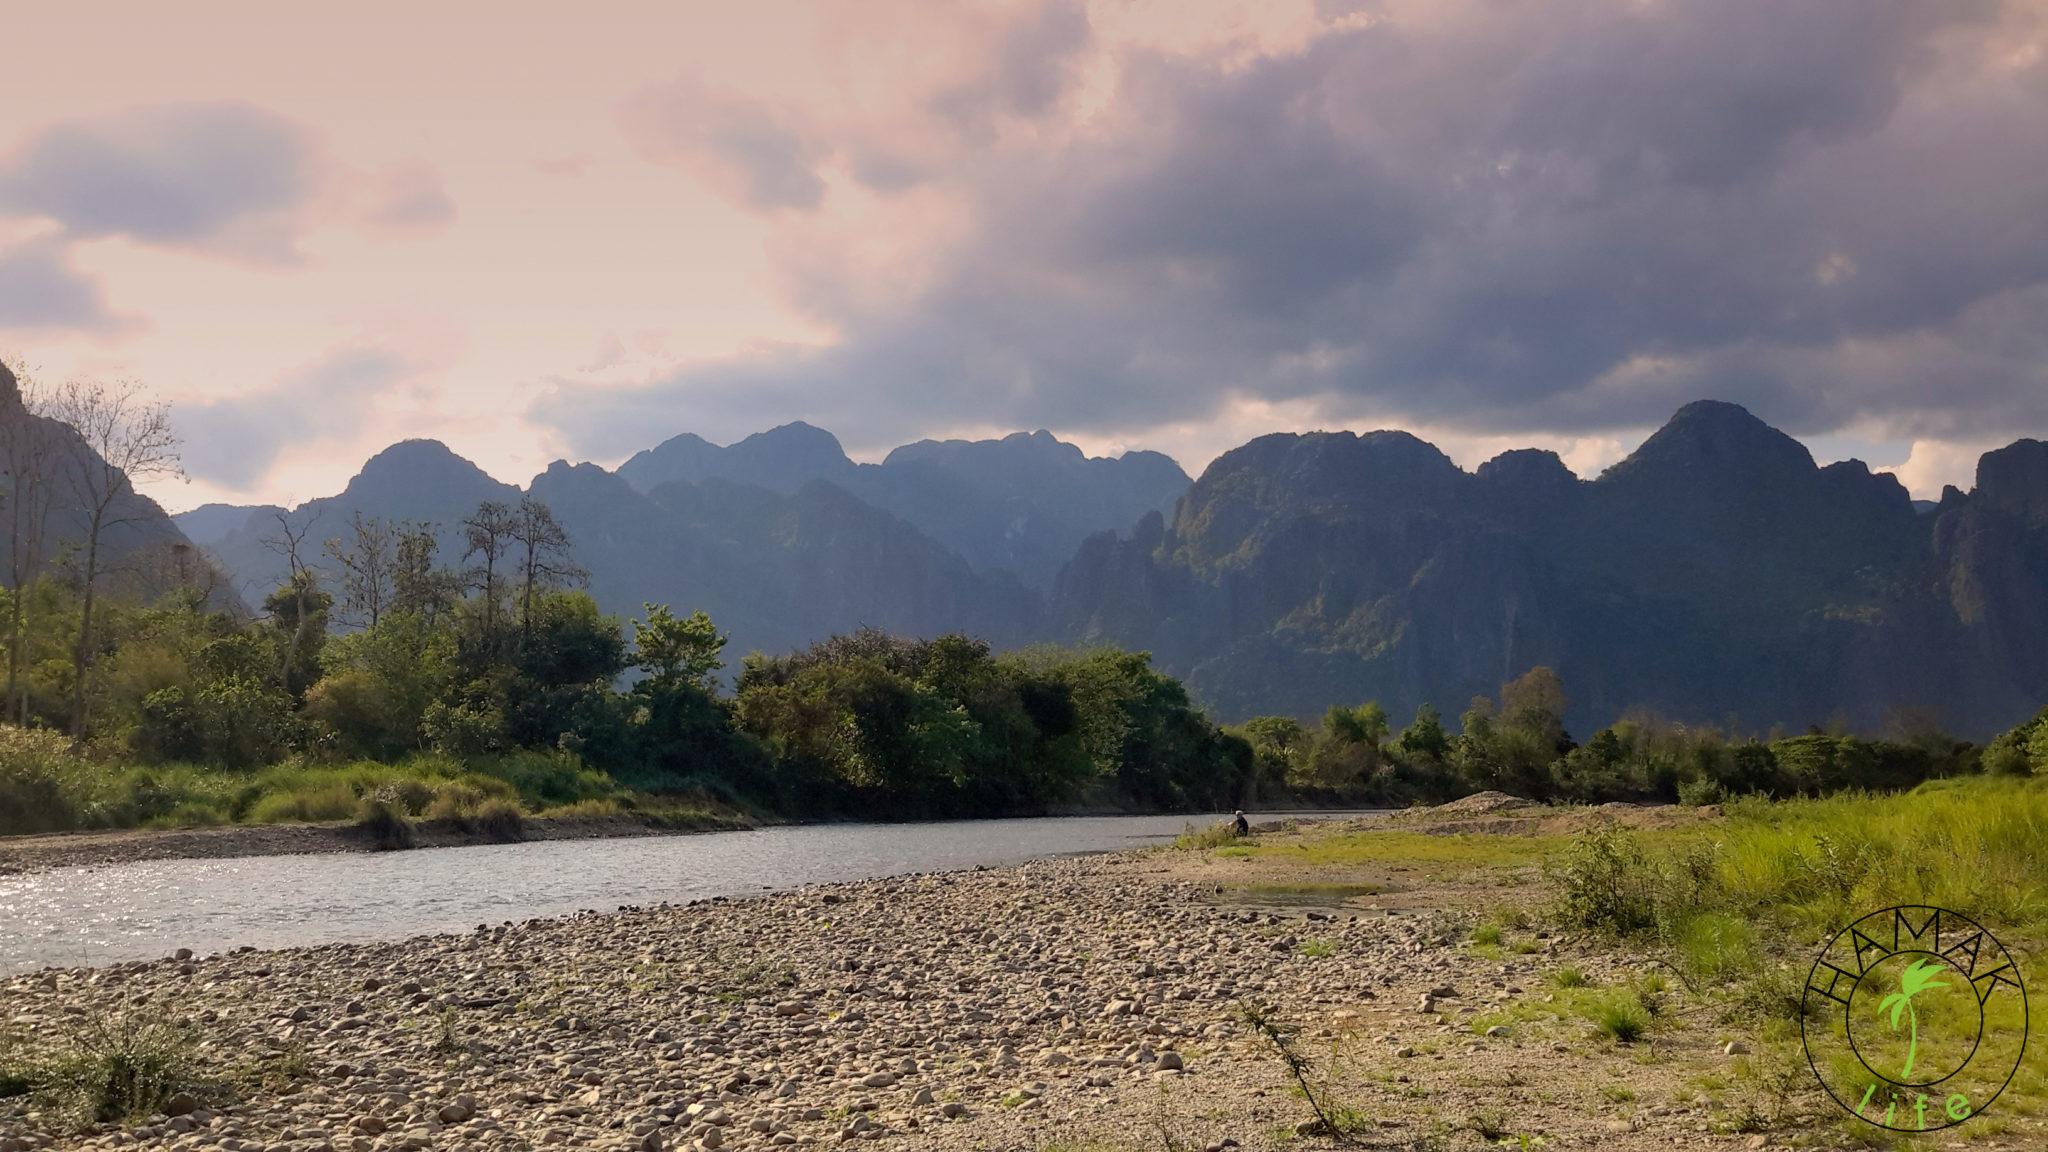 Krajobraz górski w Vang Vieng w Laosie